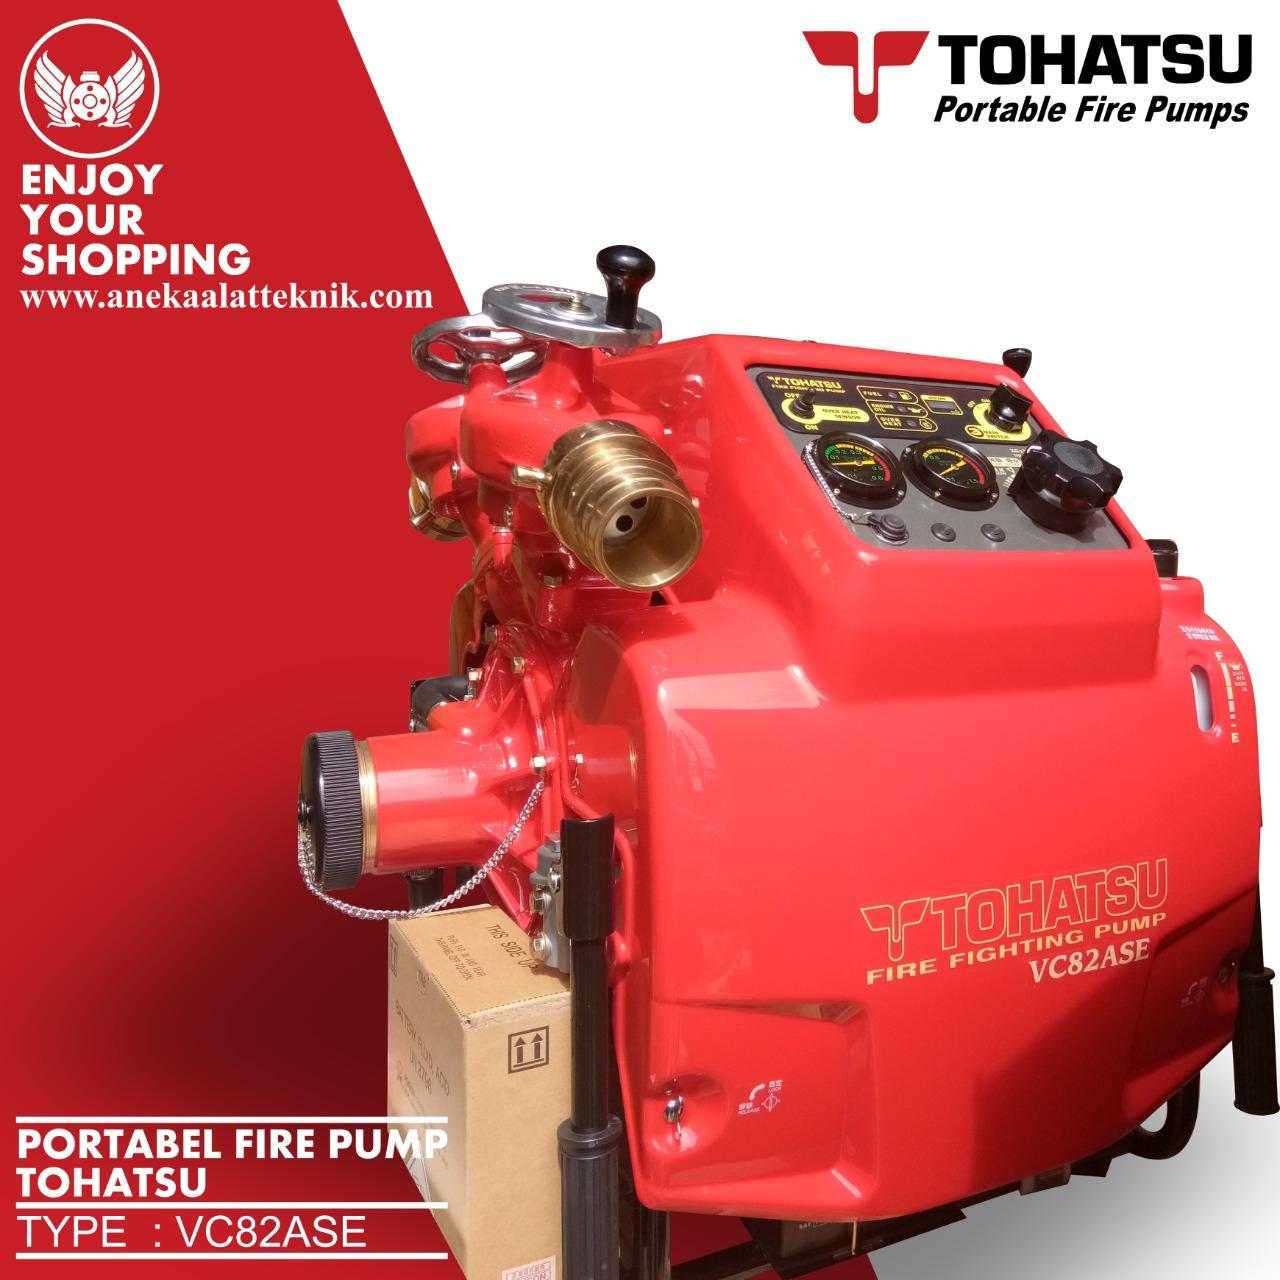 Tohatsu Portable Fire Pump Model Vc82ase (2)